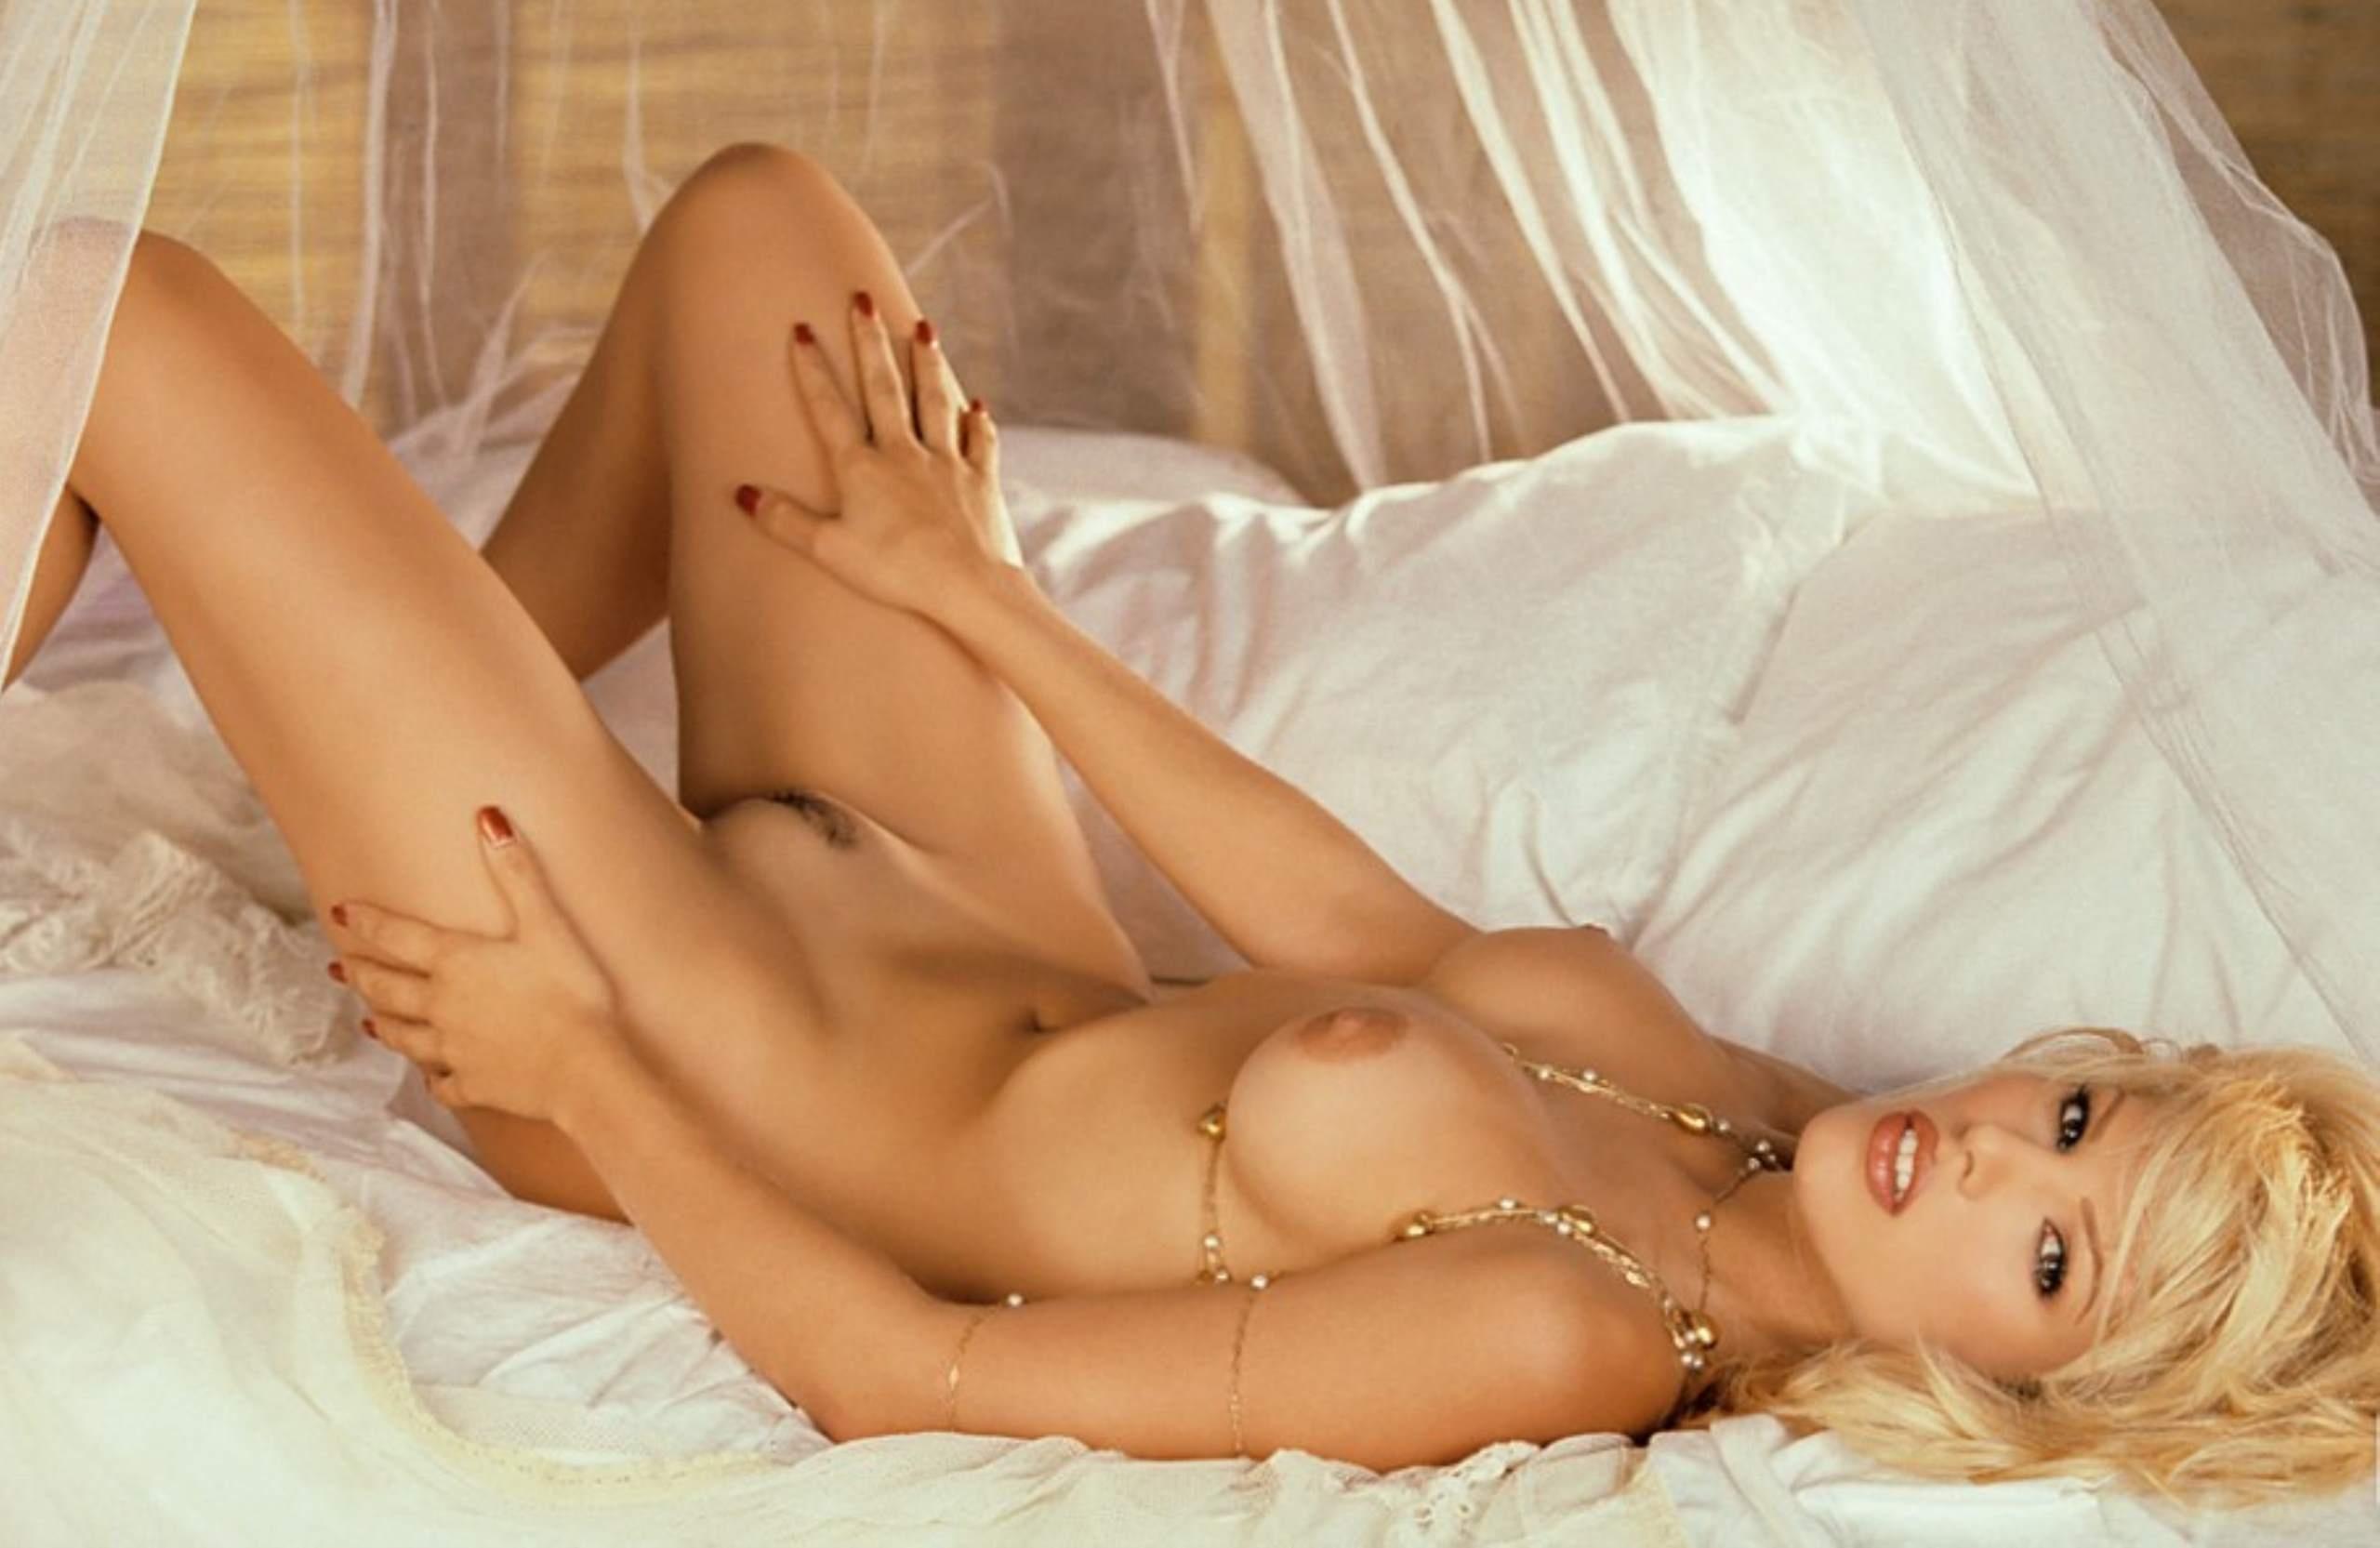 Hot sexy girls olson naked, tiptopgifs creampies